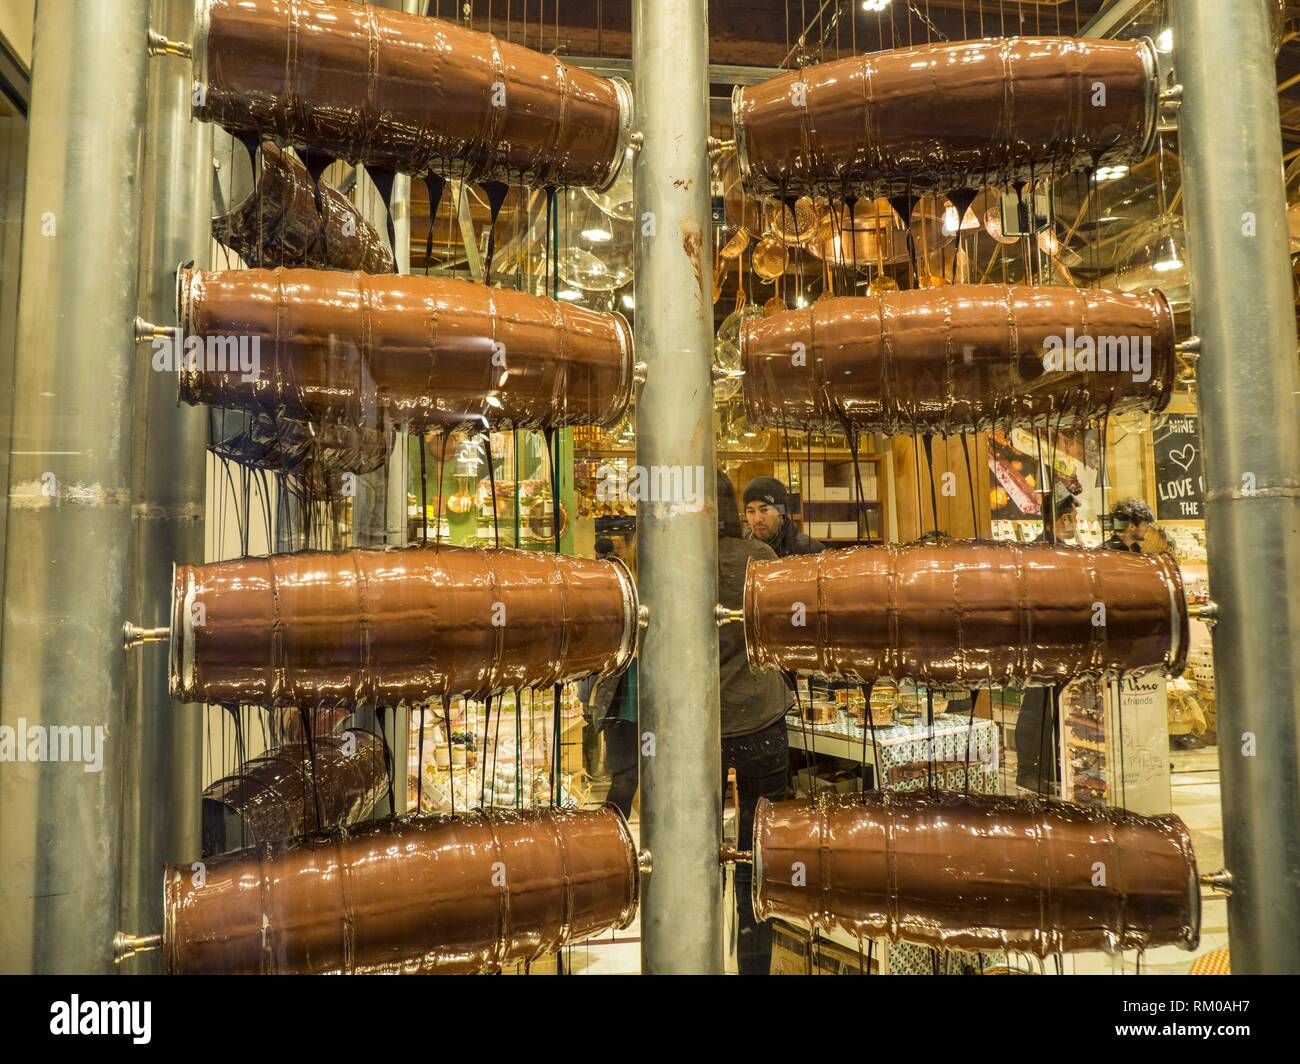 Chocolate Maker. Venice, Italy. - Stock Image